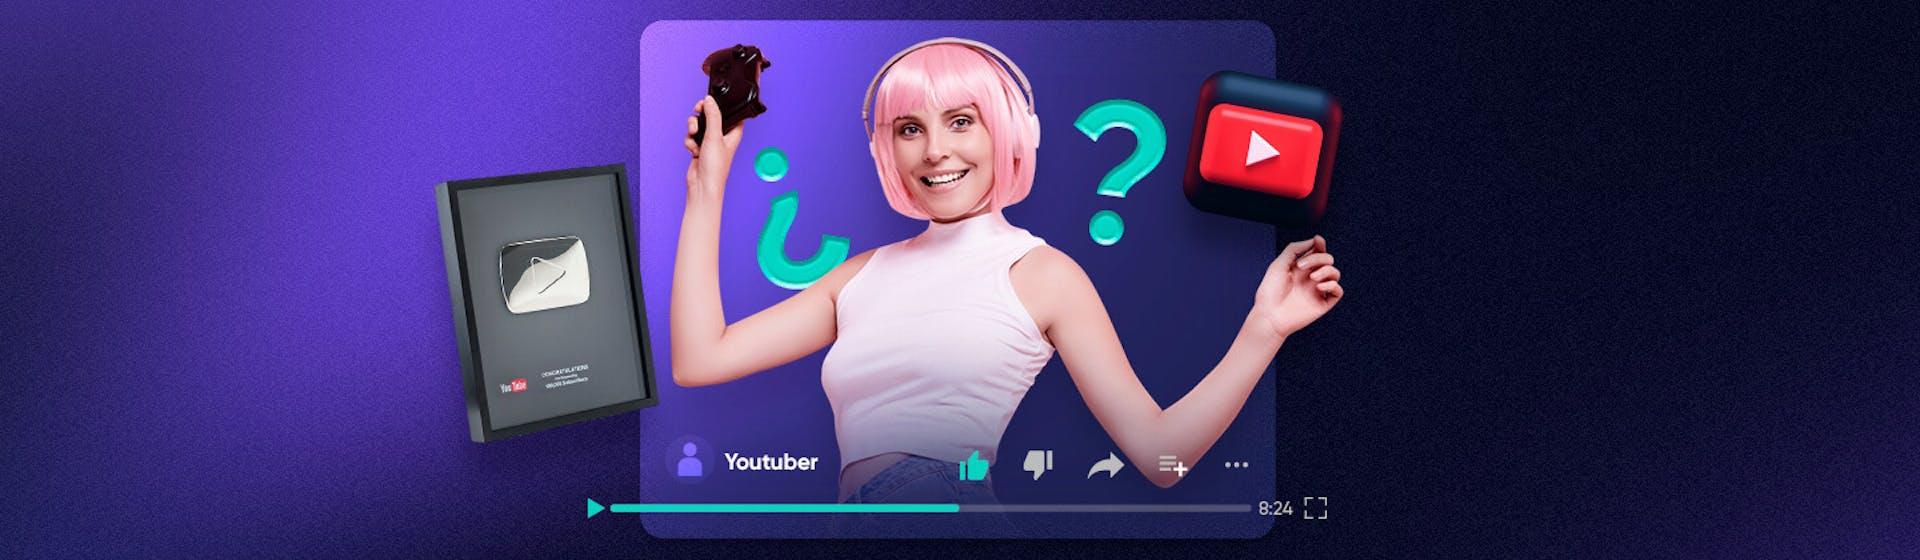 Test sobre qué youtuber eres: ¡Descubre qué te hace influencer!